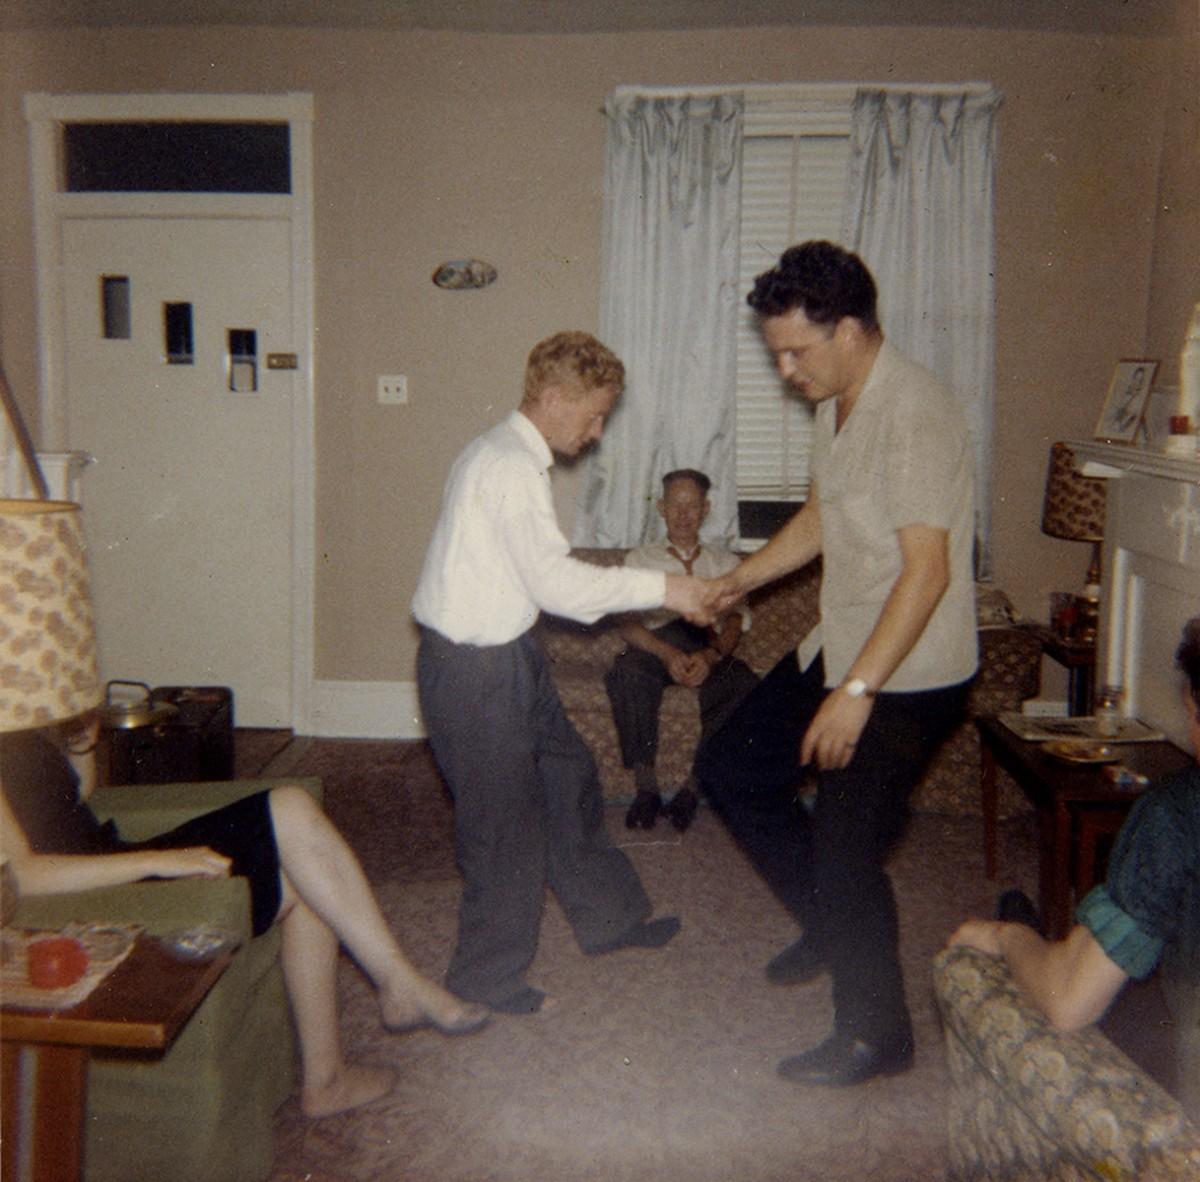 Conlon // County Monaghan :: House Party in Germantown, Philadelphia, U.S. 1960's